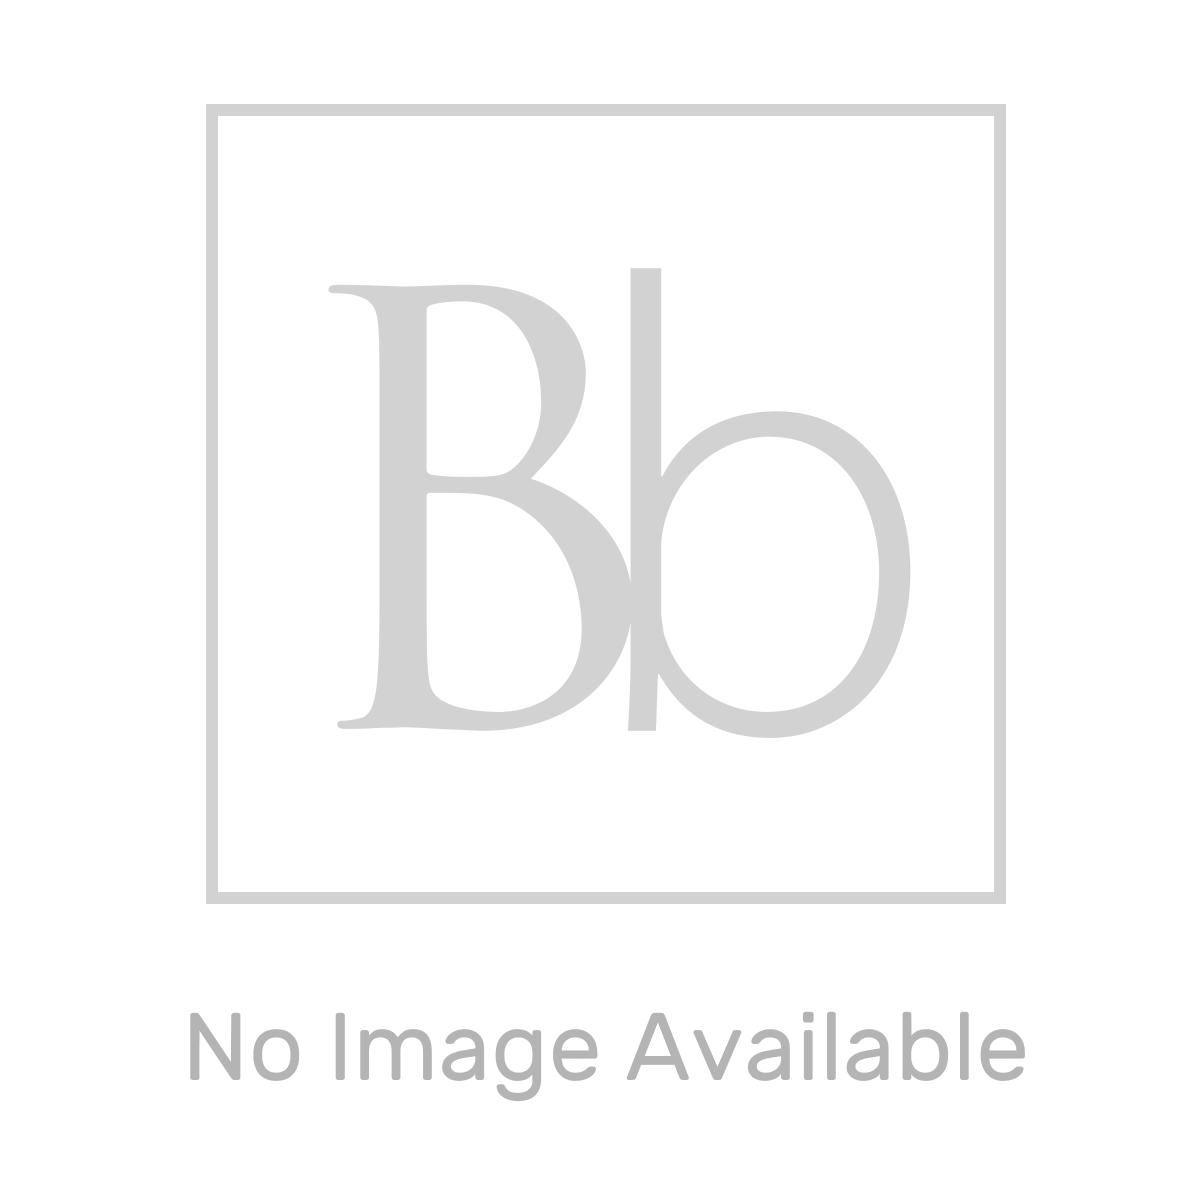 RAK Resort Wall Hung Hidden Fixation Toilet with Wrap Over Soft Close Seat